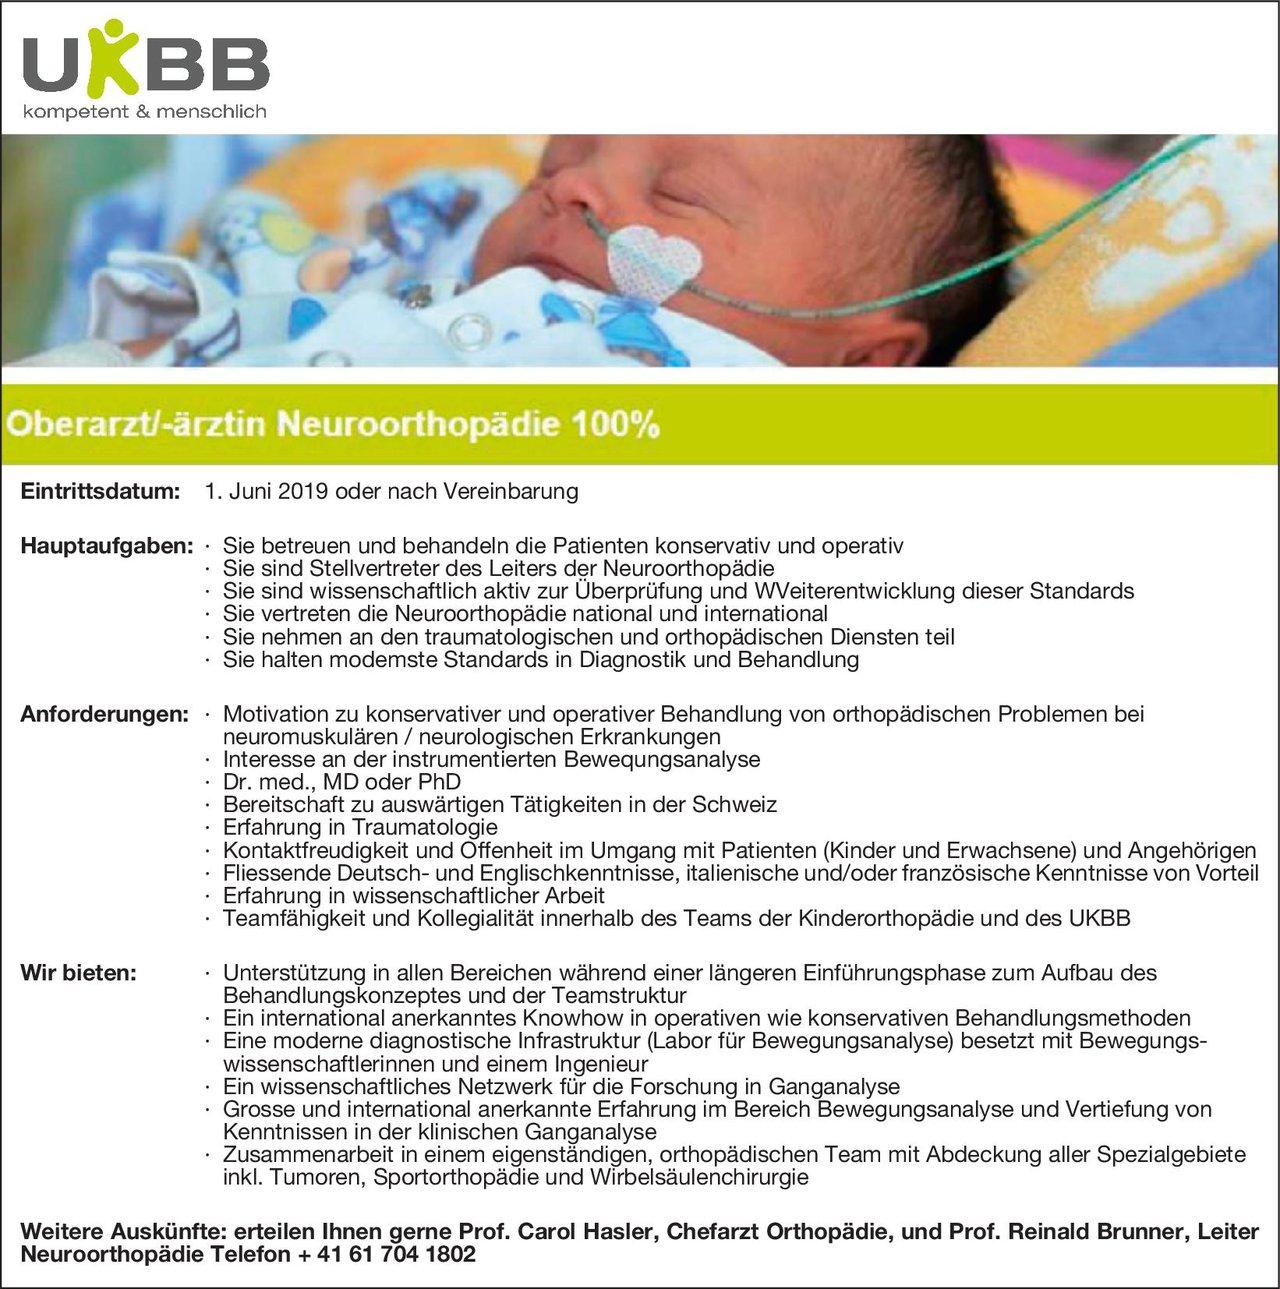 UKBB - Universitäts-Kinderspital Oberarzt/-ärztin Neuroorthopädie 100%  Orthopädie und Unfallchirurgie, Chirurgie, Neurologie Oberarzt